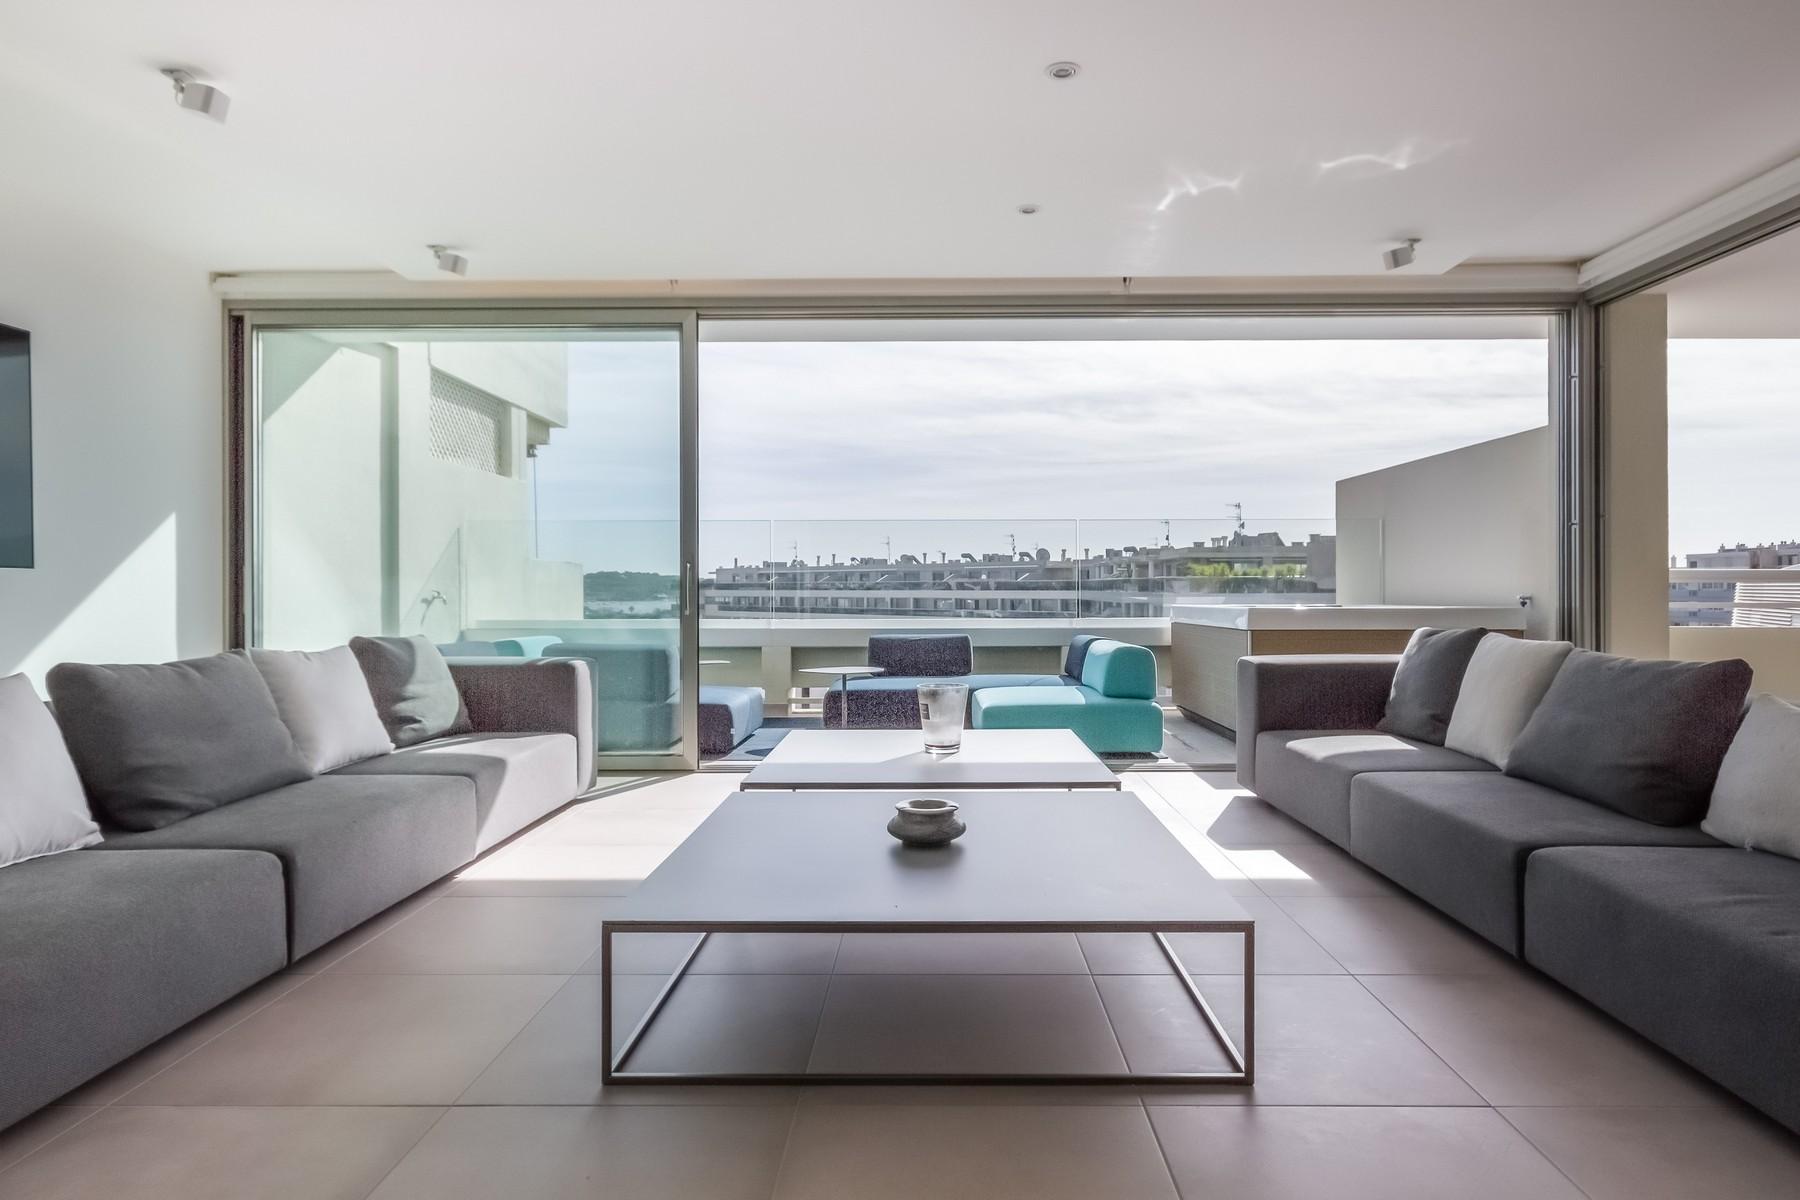 Apartment for Sale at Luxury Apartment near Ibiza Marinas Ibiza, Ibiza, 07800 Spain